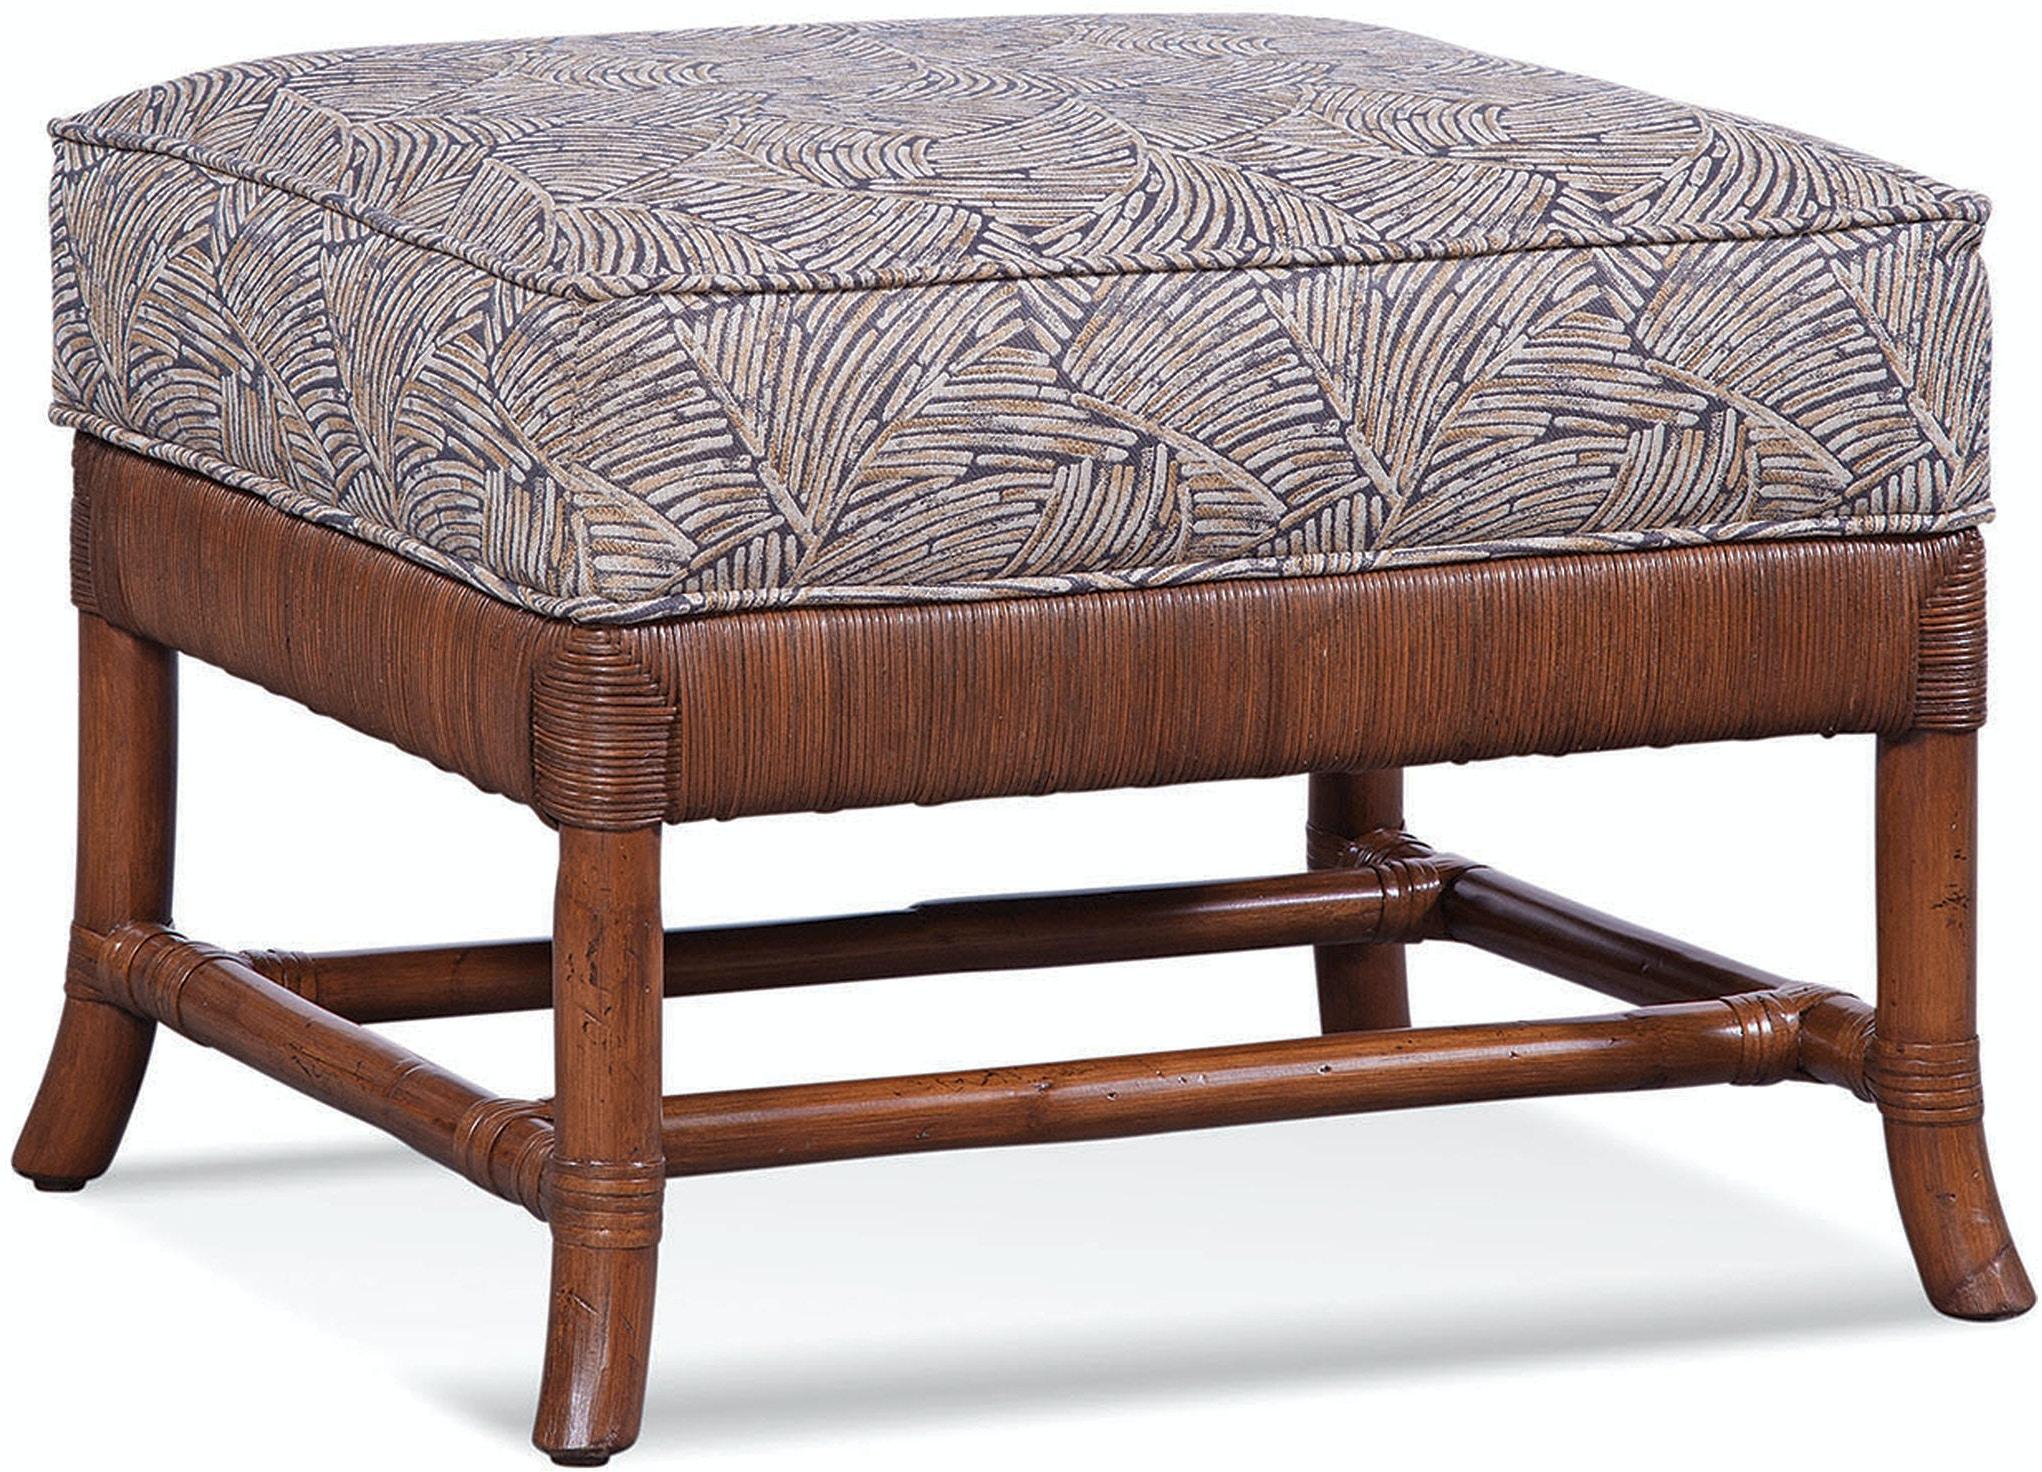 Braxton Culler Living Room Ottoman 1007 009 Zing Casual